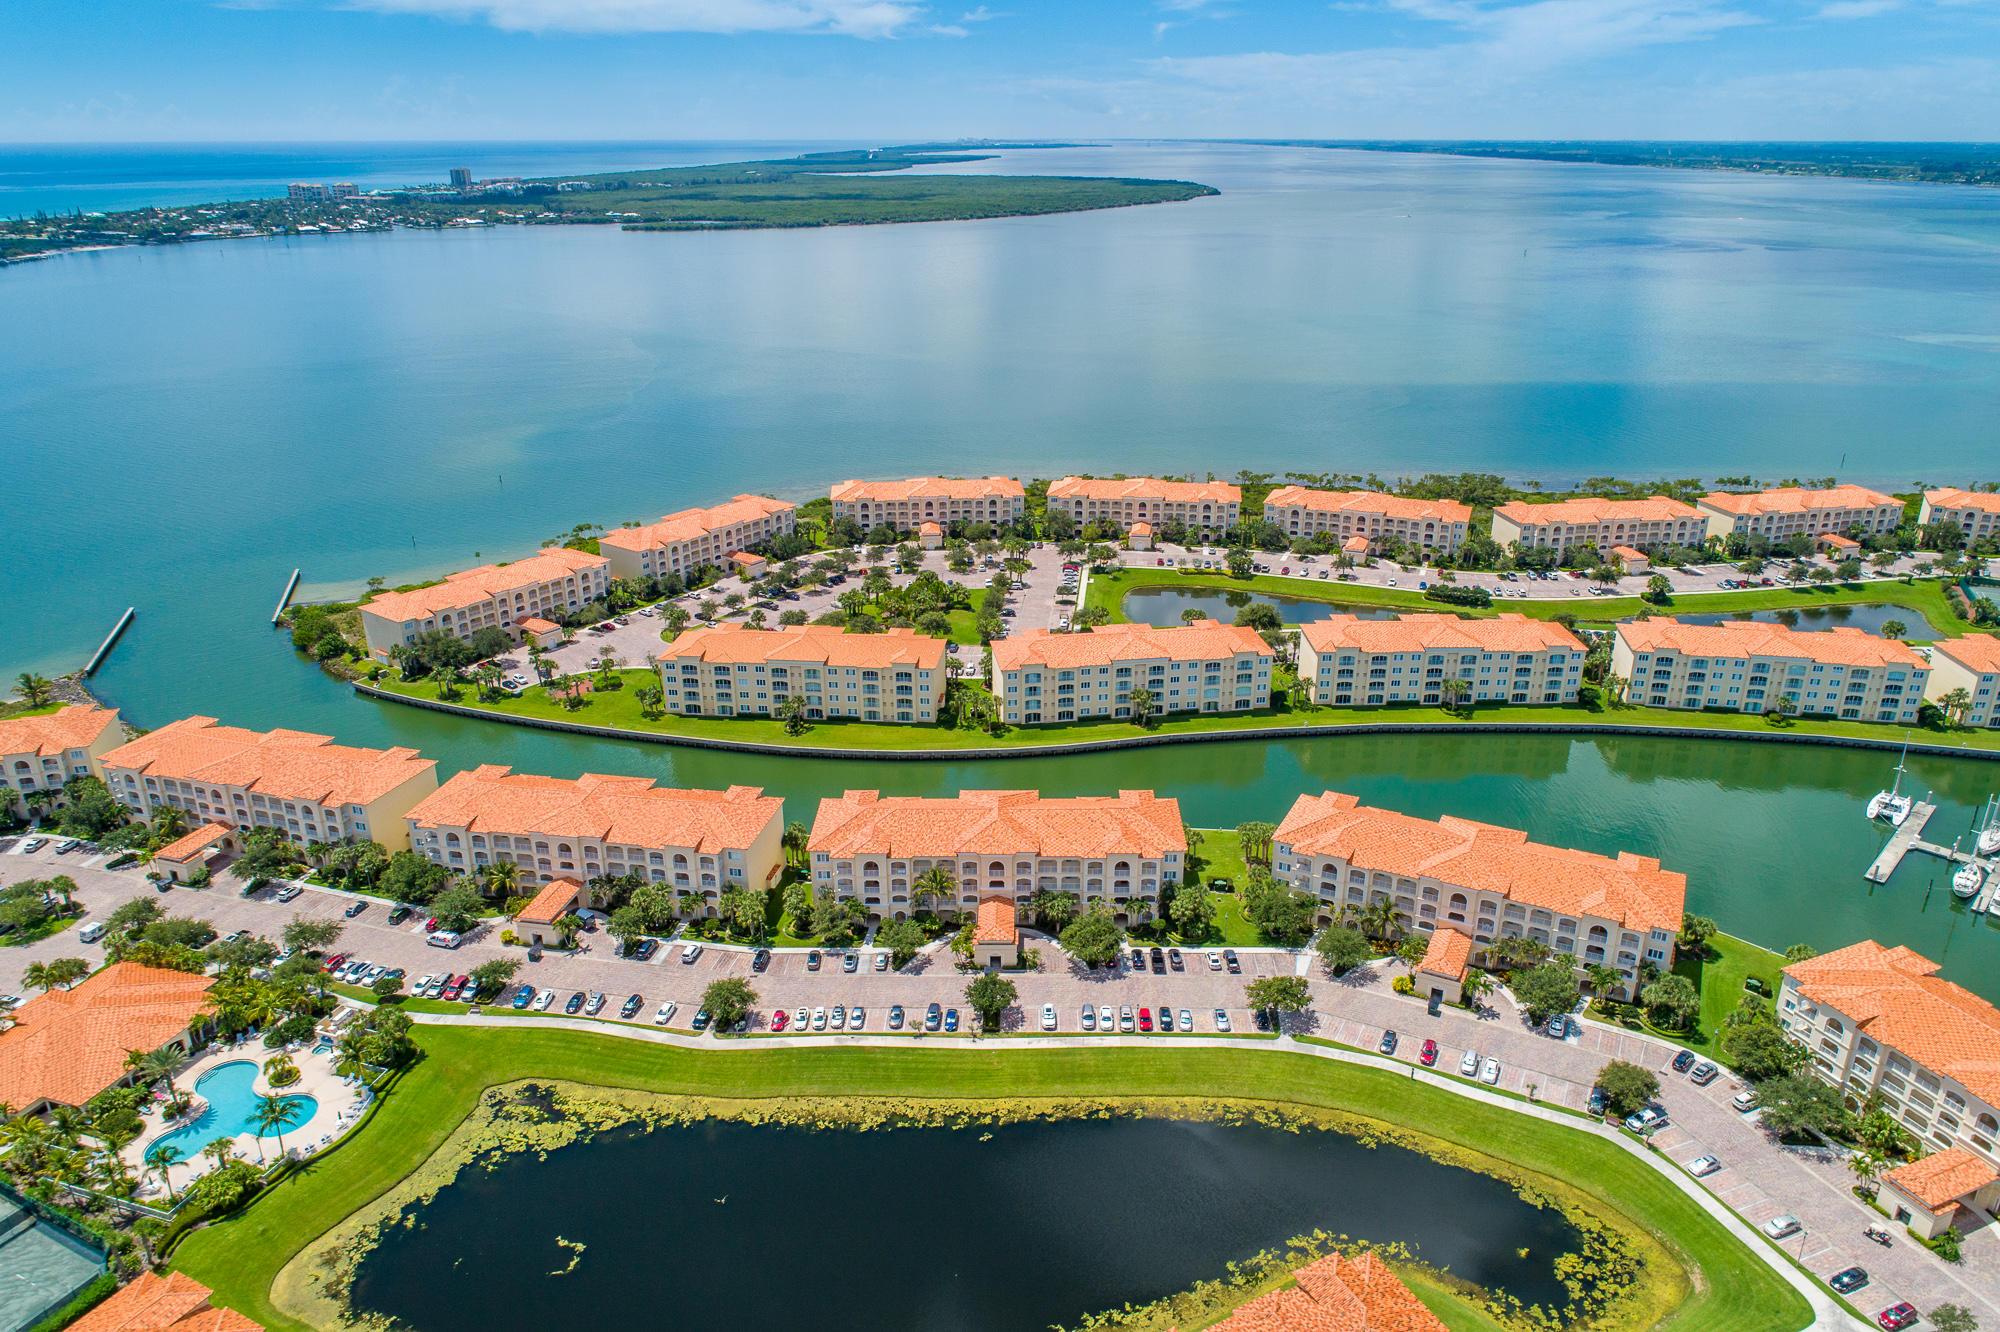 7 Harbour Isle E Drive, Hutchinson Island, FL 34949